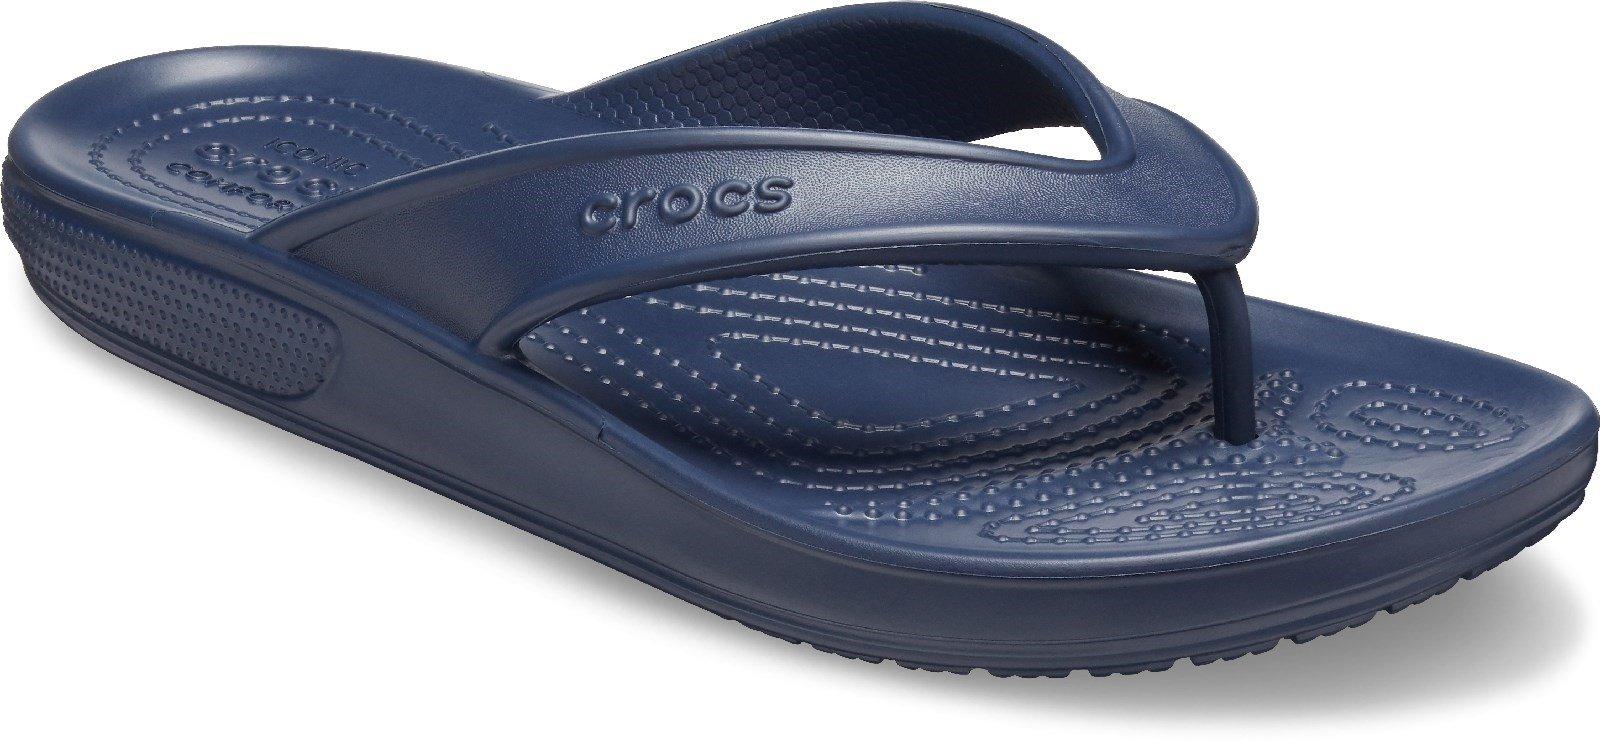 Crocs Women's Classic II Flip Flop Various Colours 30609 - Navy 3